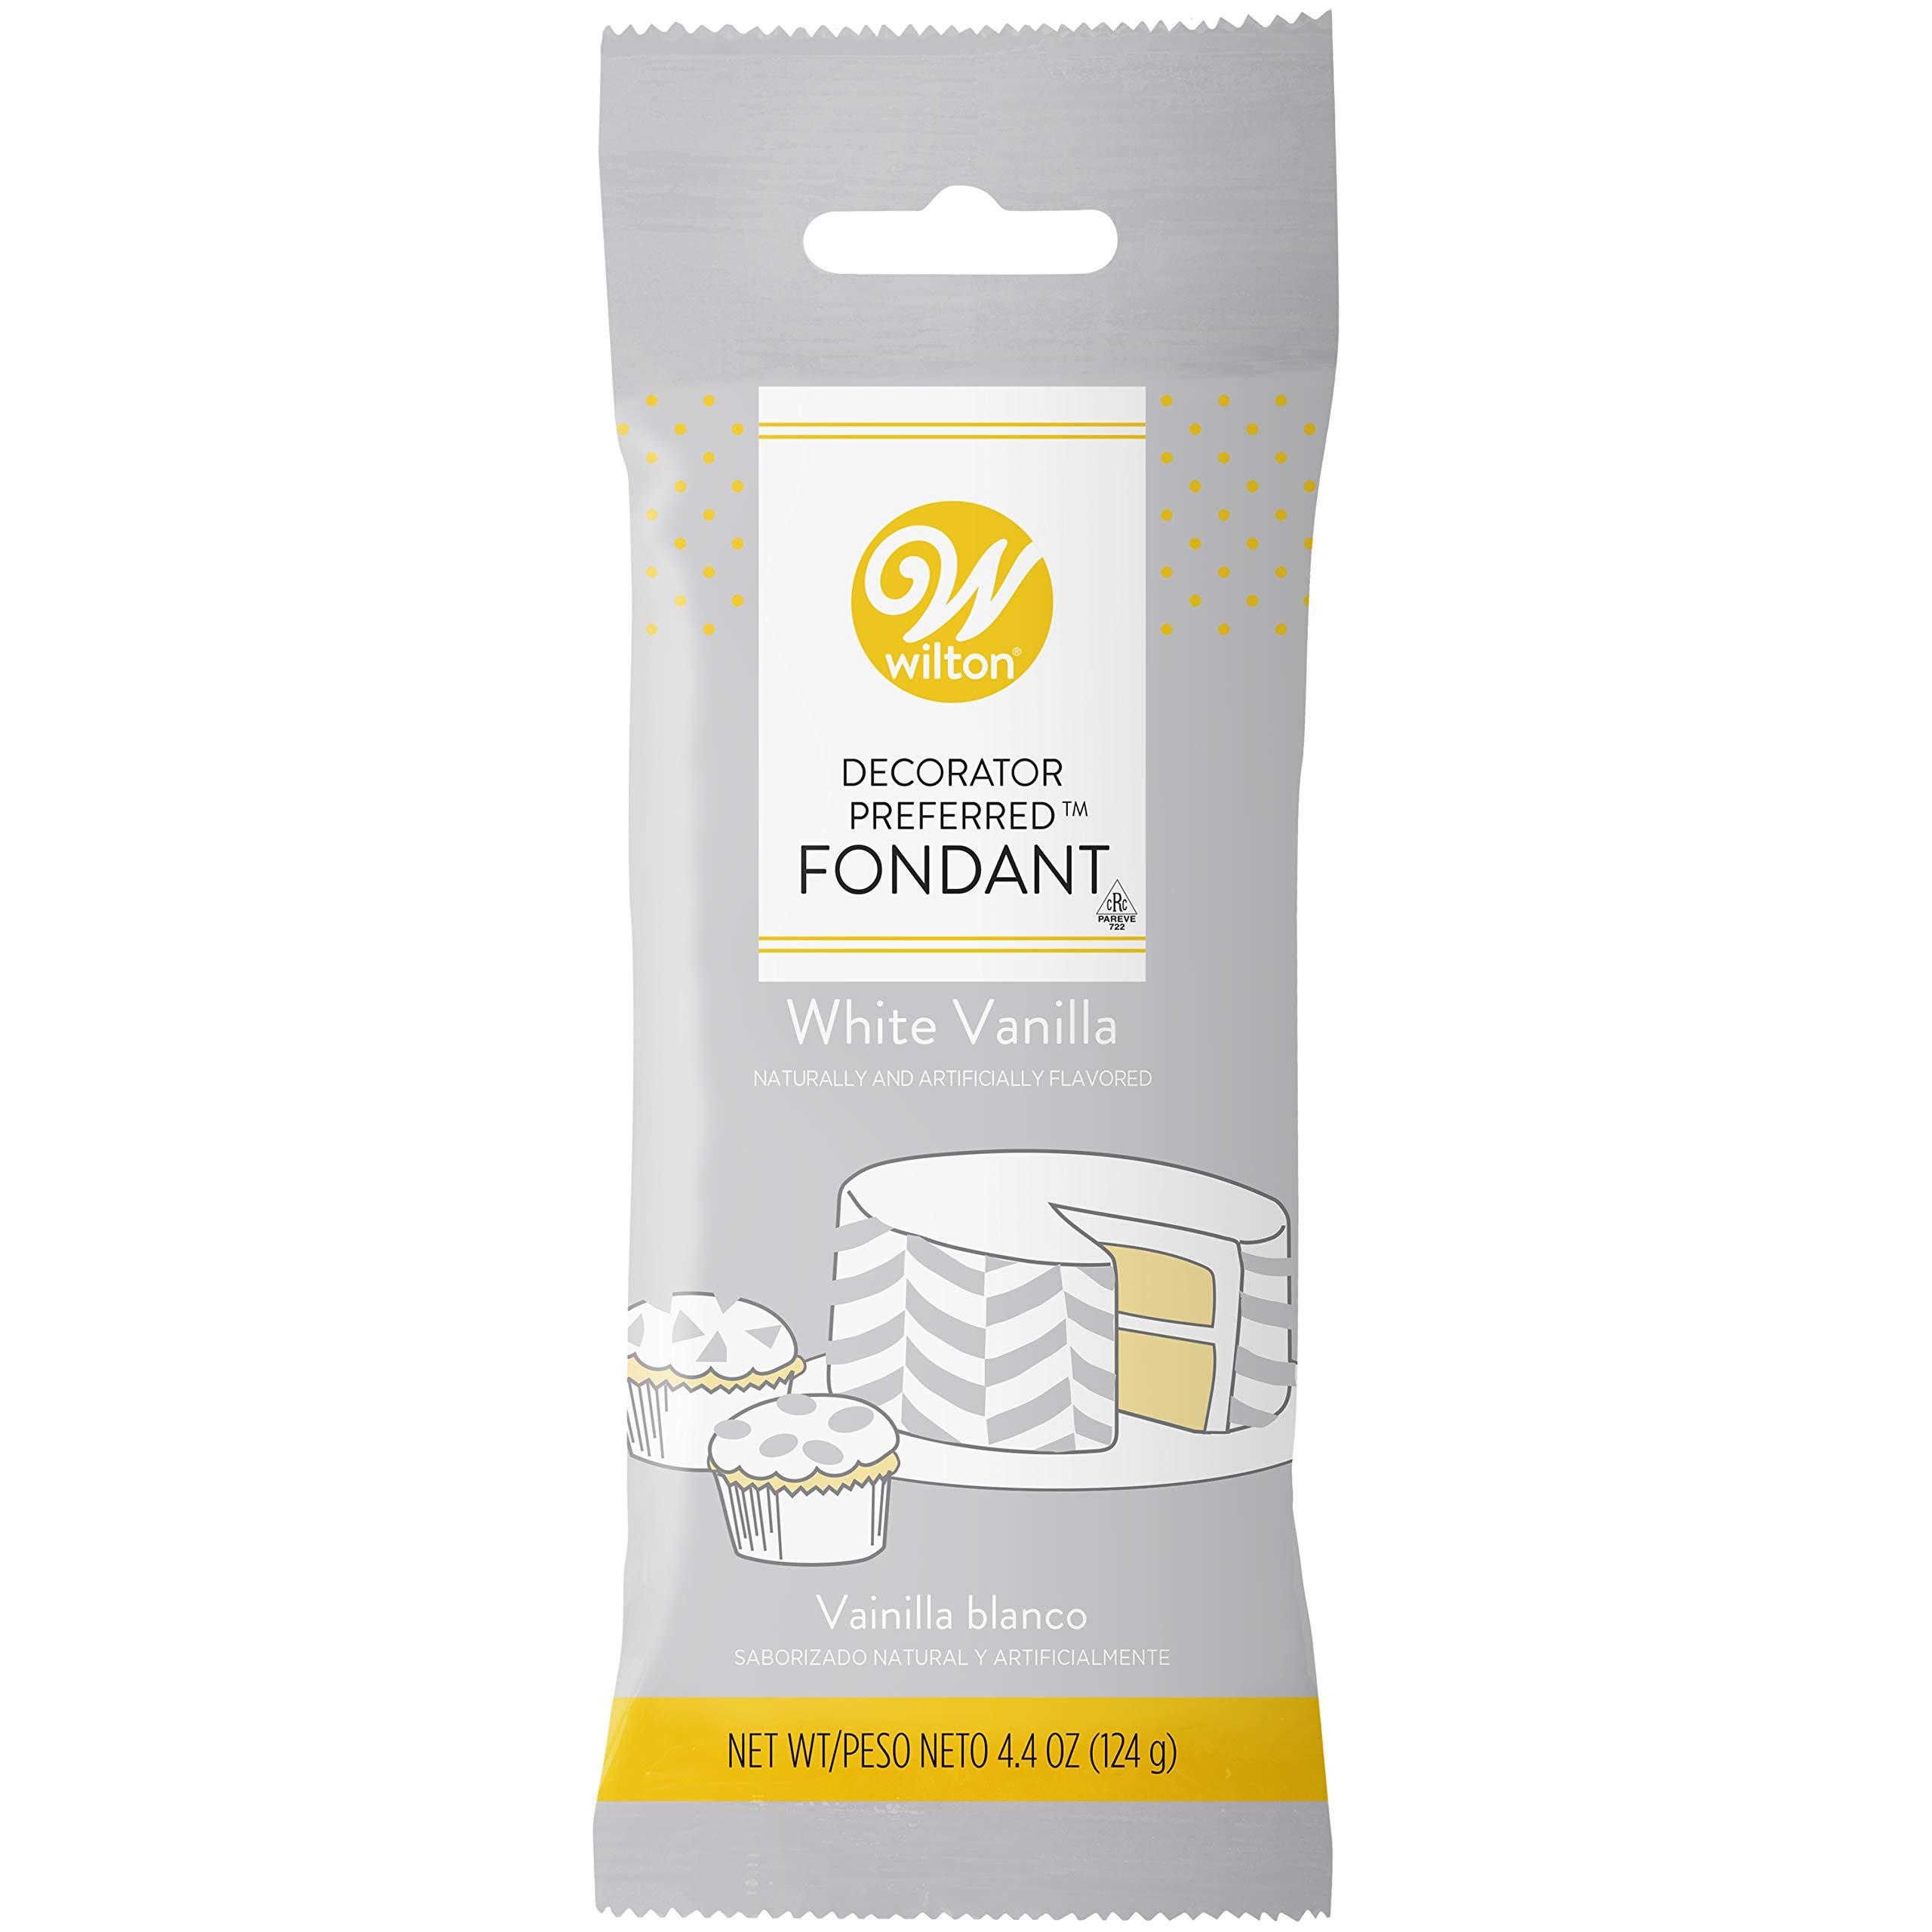 Wilton White Vanilla Decorator Preferred Fondant Pack 4.4 oz. (Packaging May Vary)